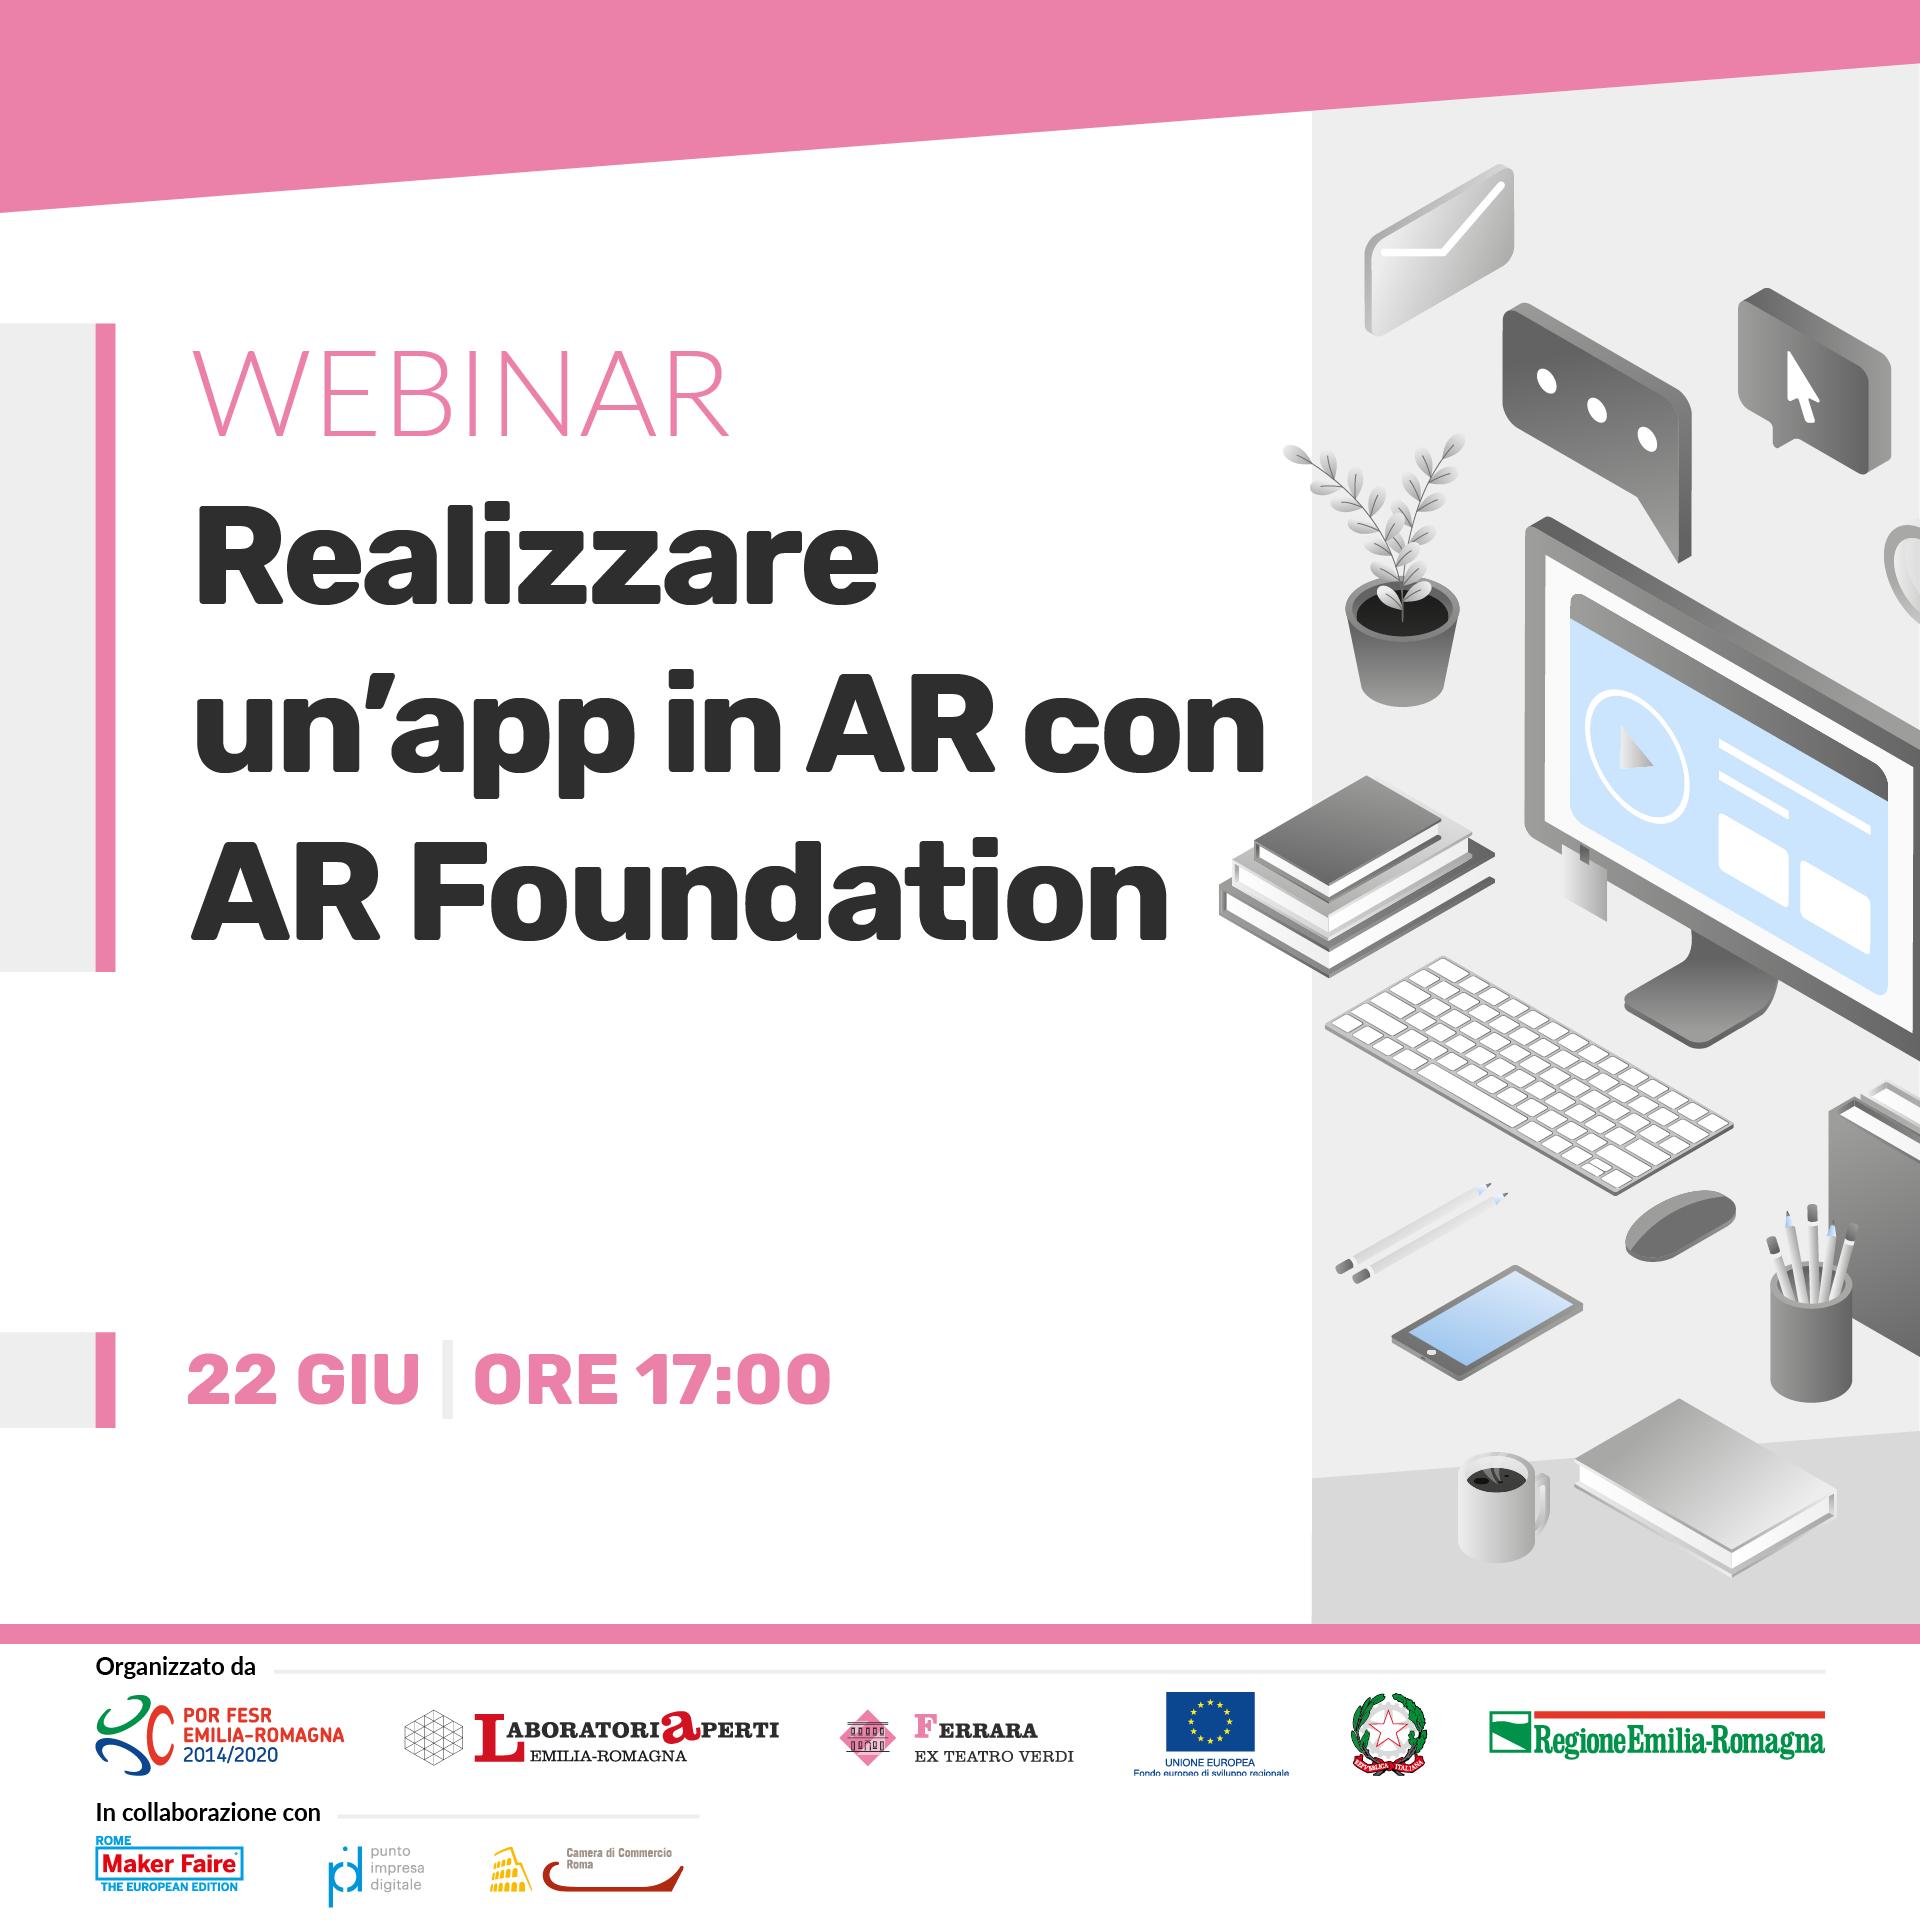 WEBINAR: Realizzare un'app in AR con AR Foundation  | 22 giugno H 17:00